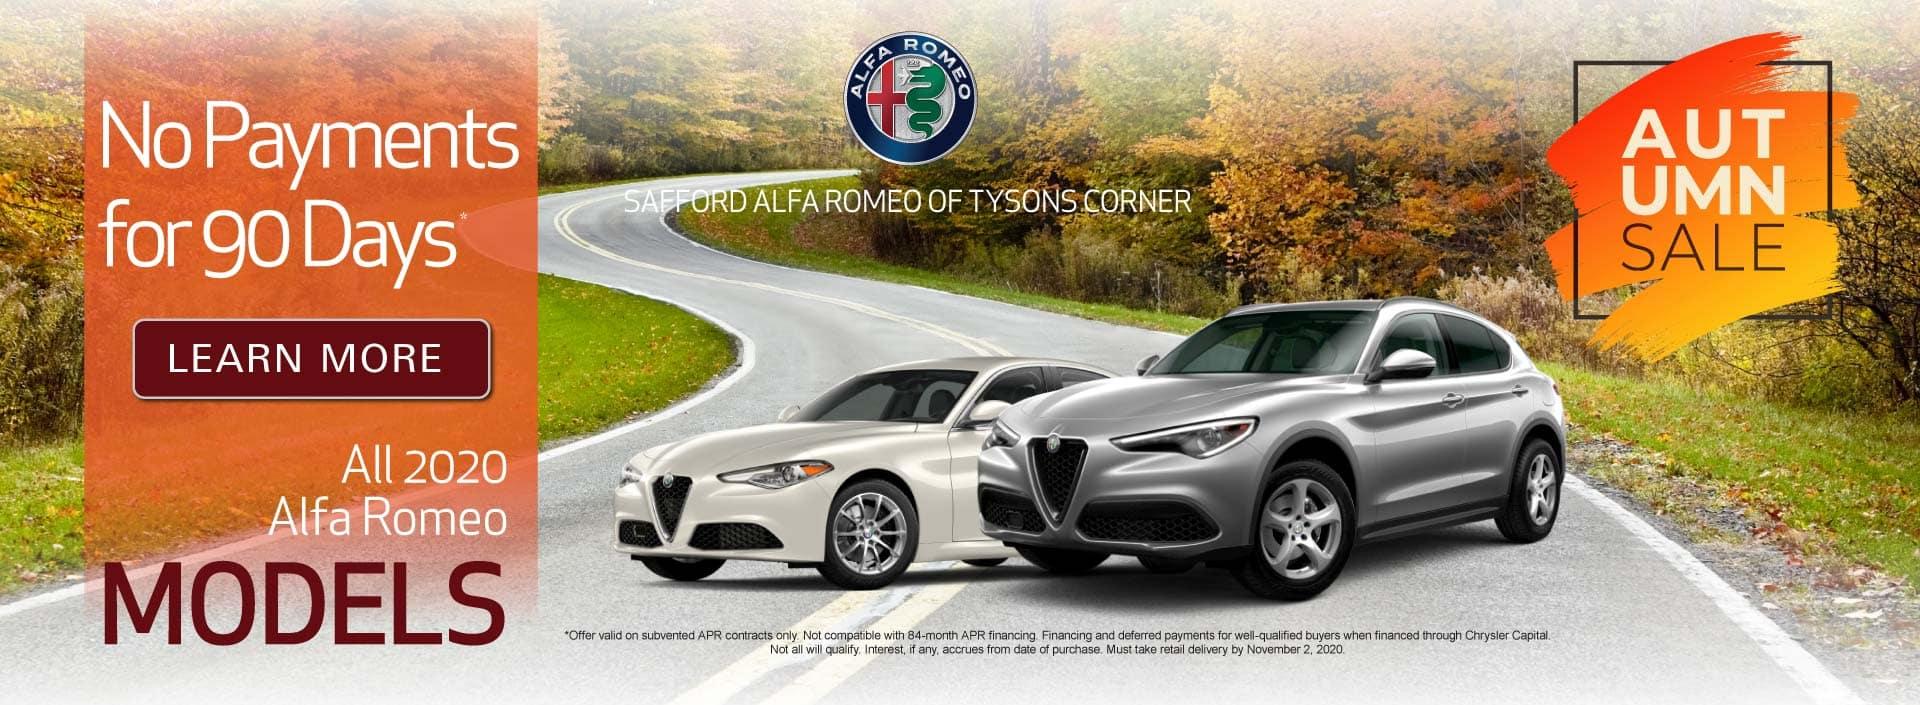 Fairfax Honda Service >> Honda Tysons Corner Service Center - Latest Cars